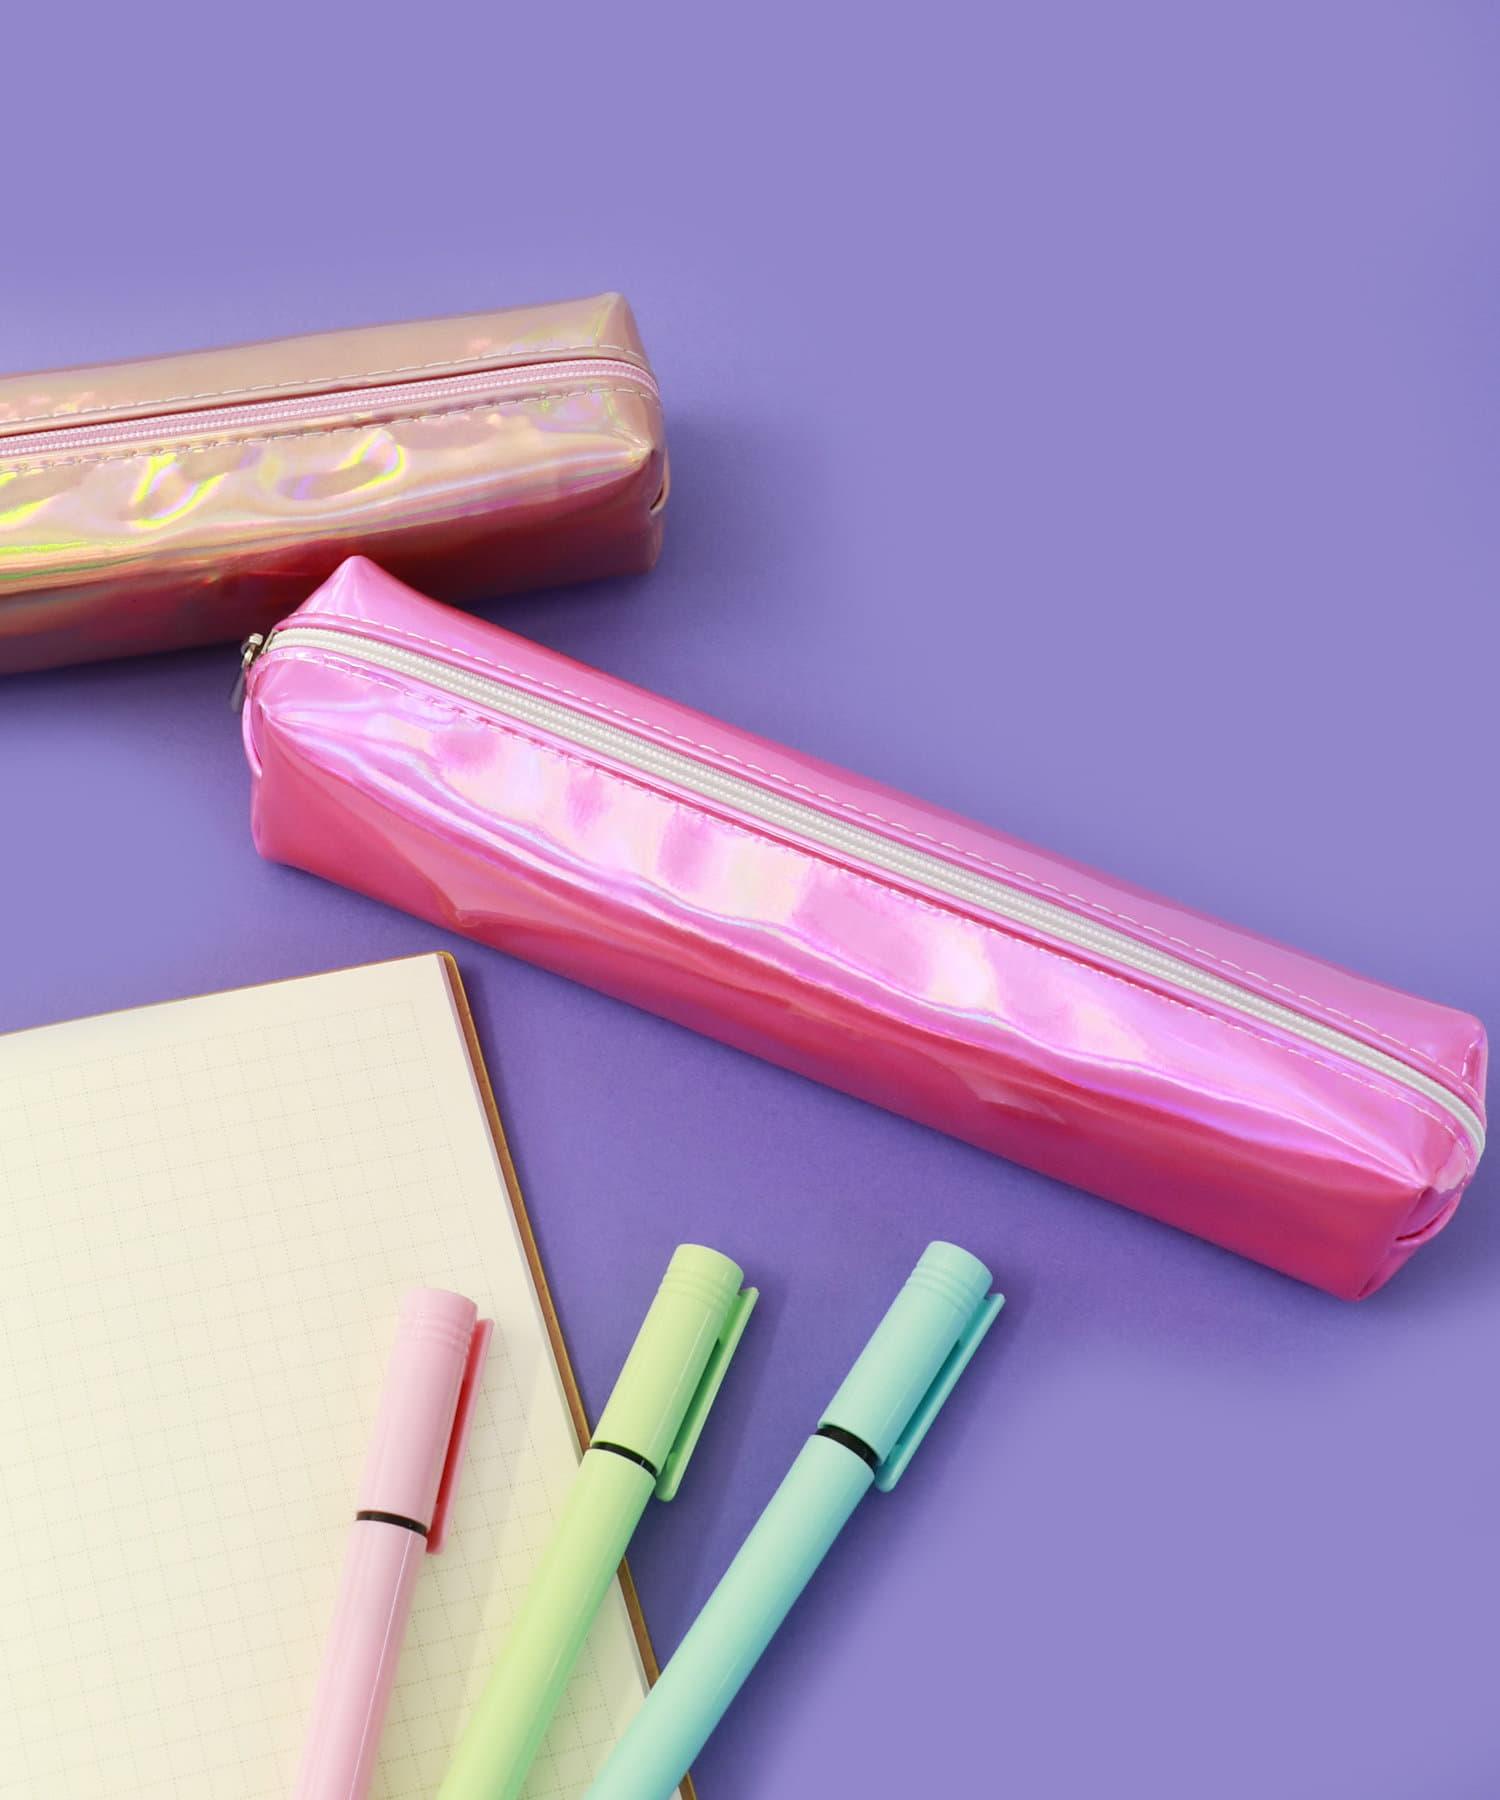 ASOKO(アソコ) ライフスタイル メタリックペンケース ピンク